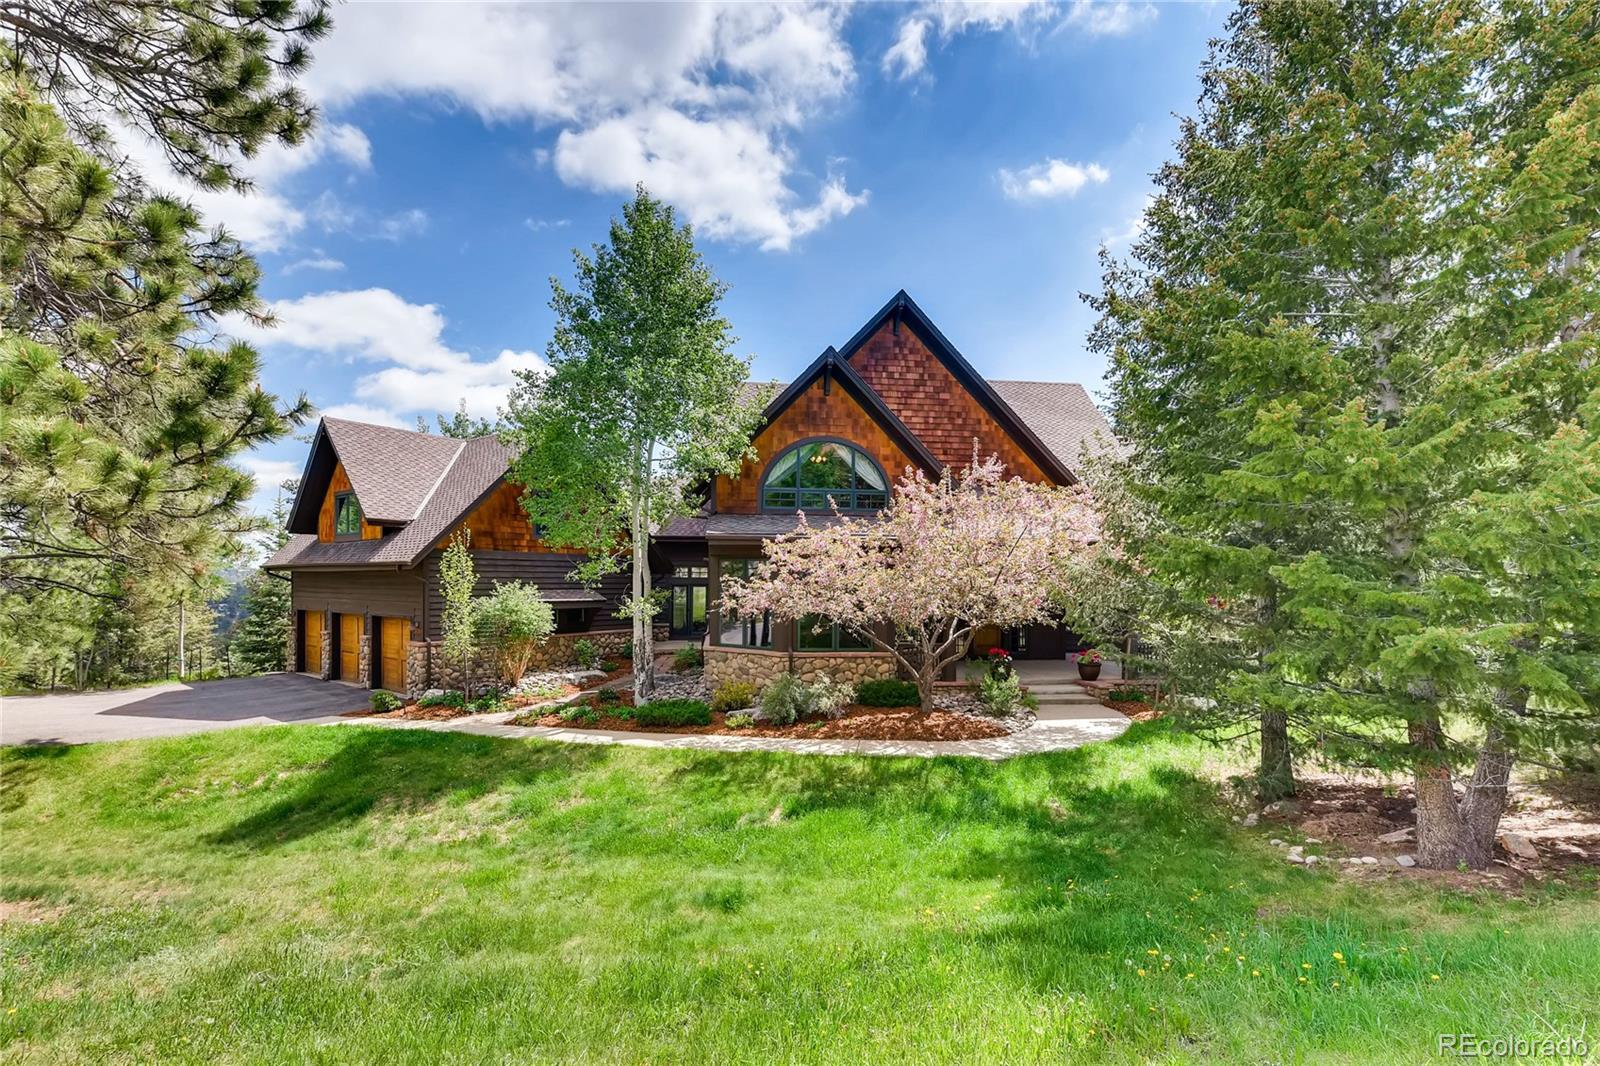 MLS# 2669686 - 1 - 31525 Golden Meadow Drive, Evergreen, CO 80439